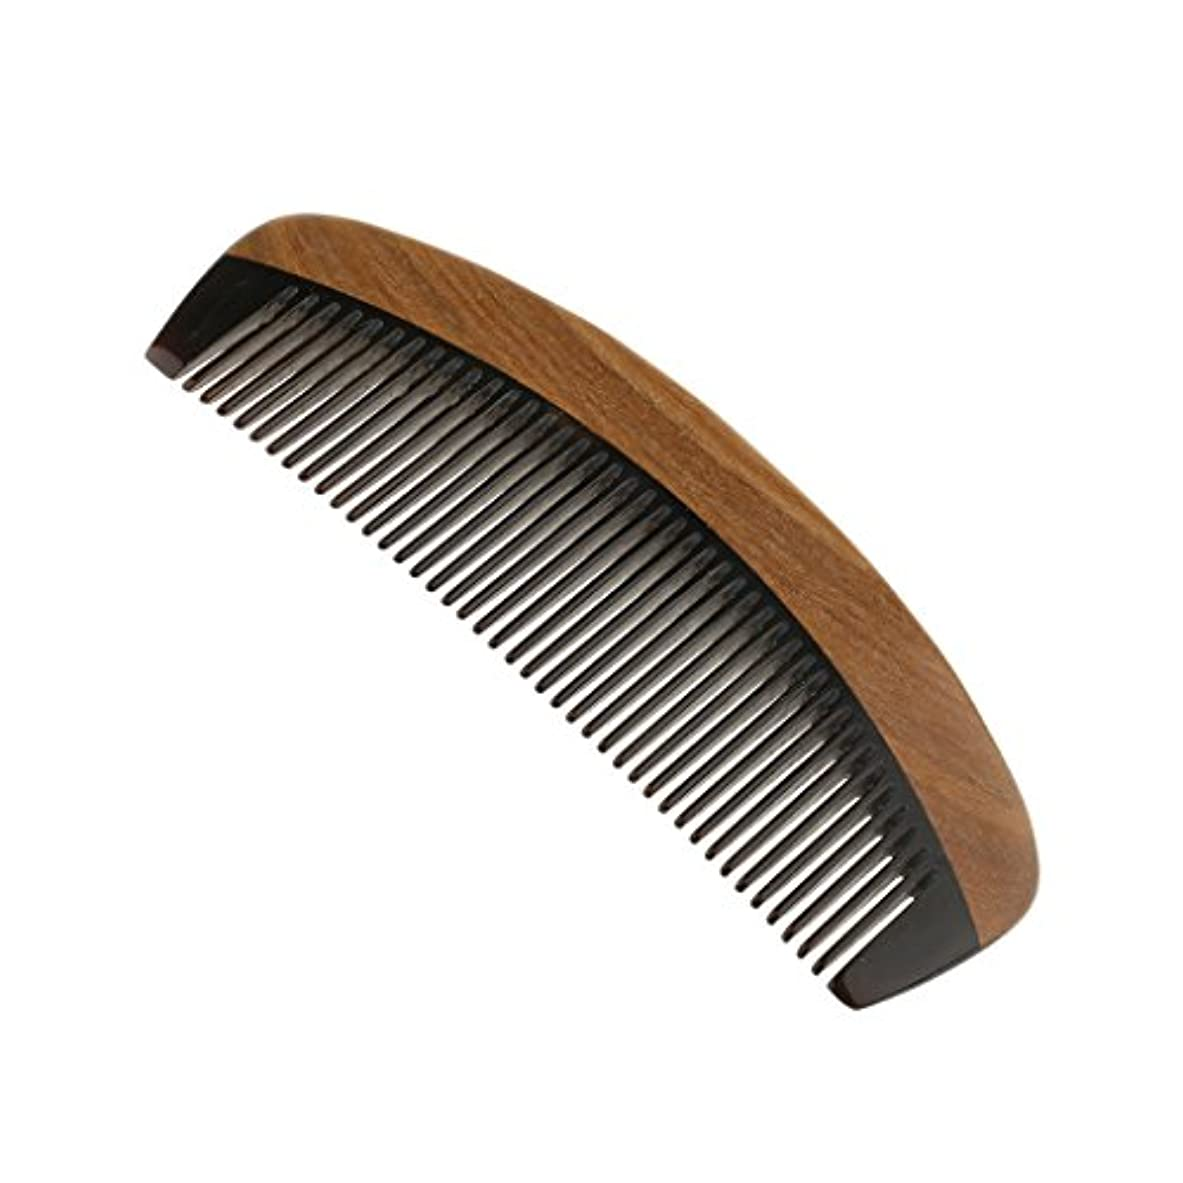 Homyl ウッドコーム 櫛 木製 ハンドメイド 静電気防止 高品質 マッサージ リラックス 便利